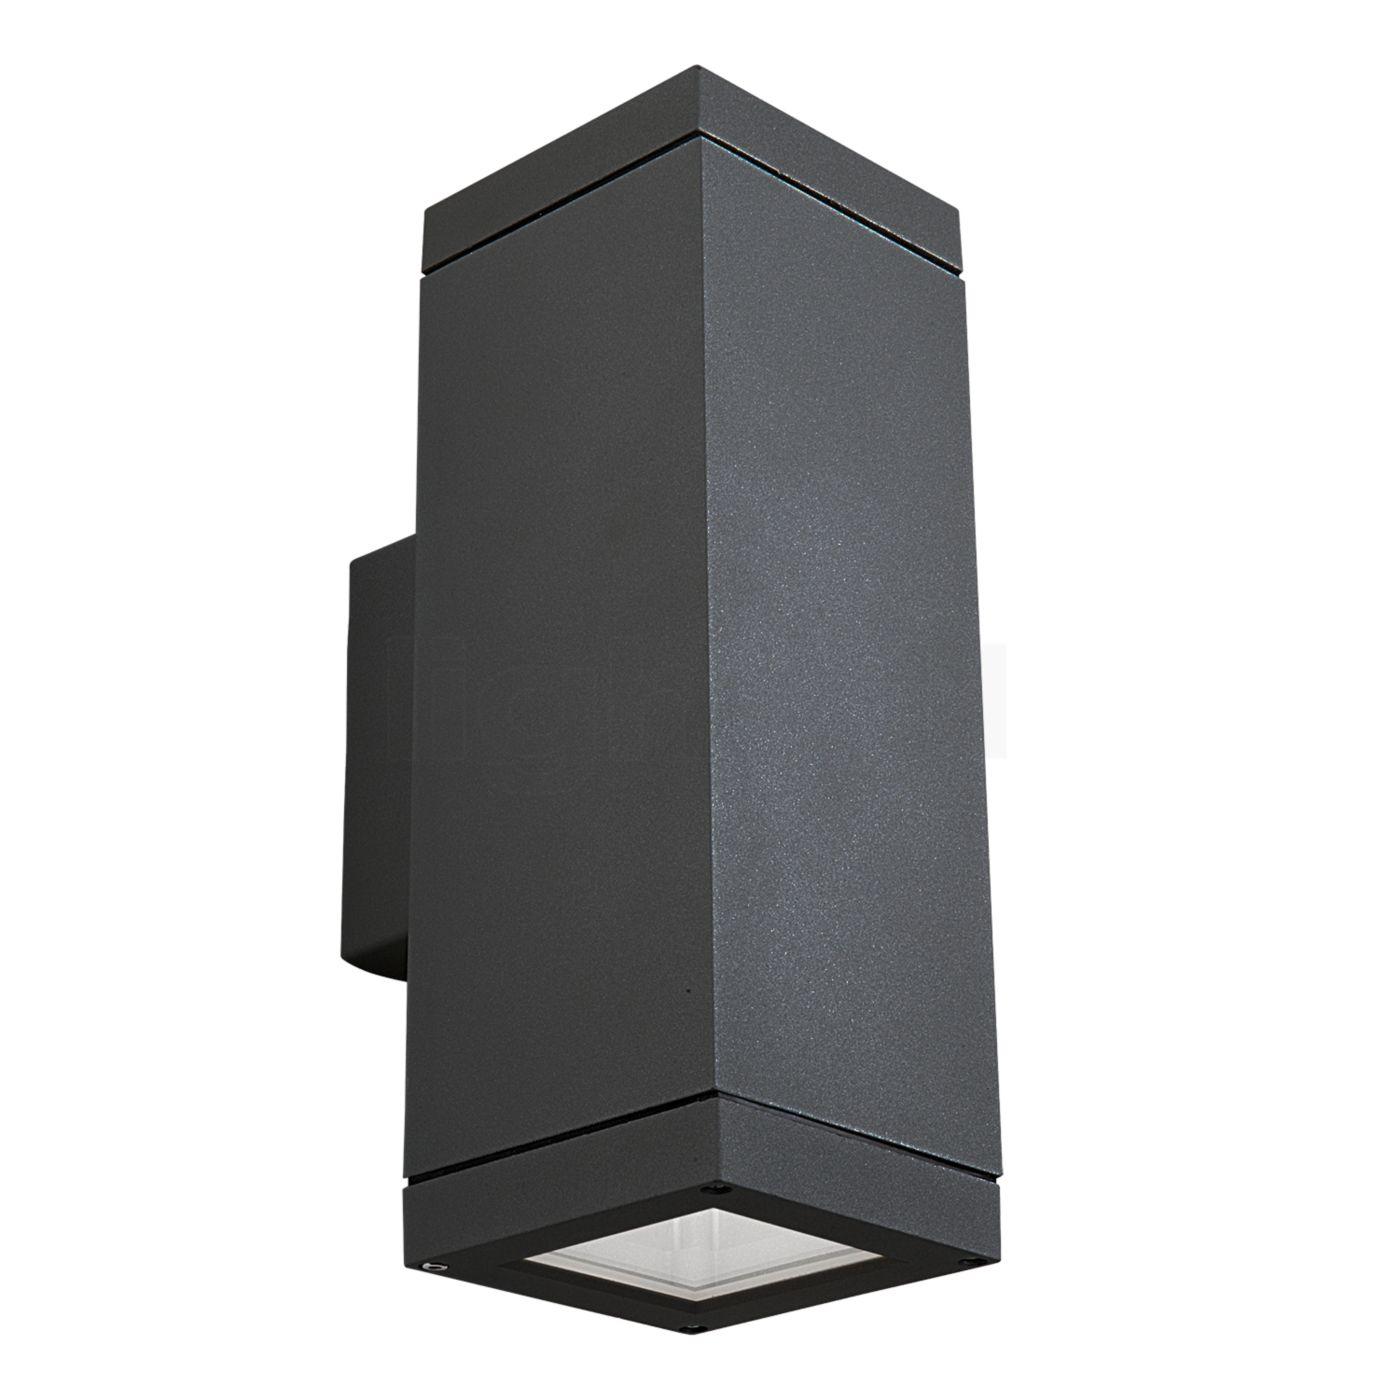 up down wall light stainless steel wall buy ledsc4 afrodita par30 updown wall light at